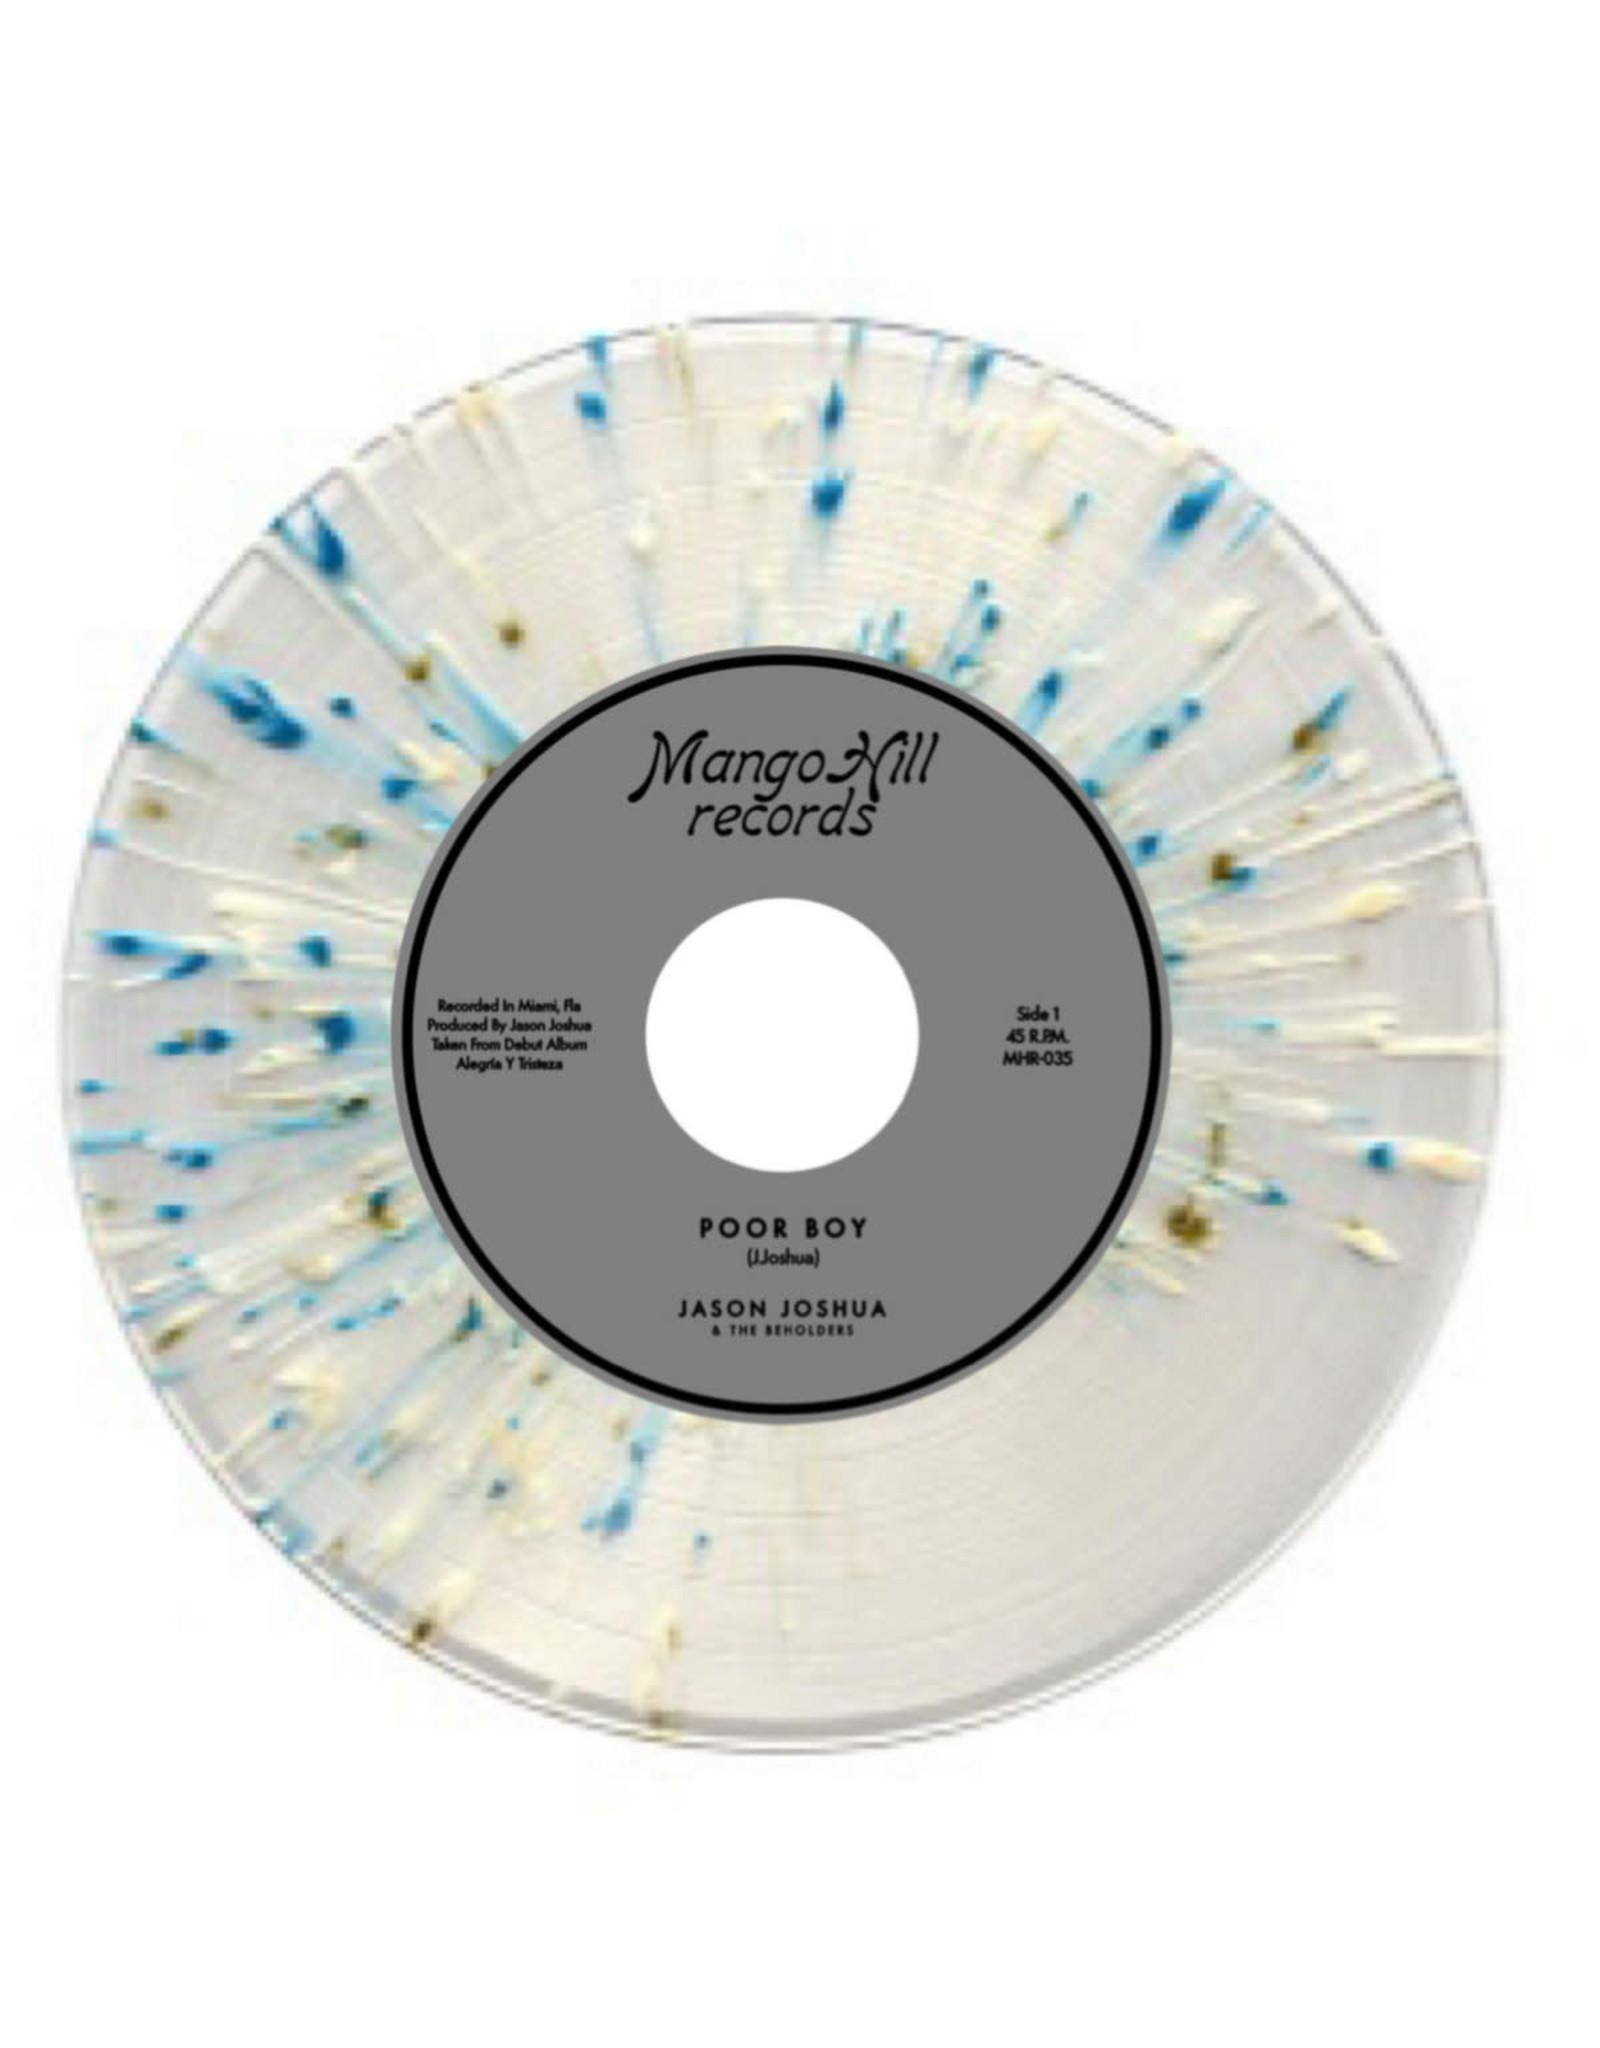 "New Vinyl Jason Joshua & The Beholders - Poor Boy / I Don't Care (Clear Blue Silver Splatter) 7"""